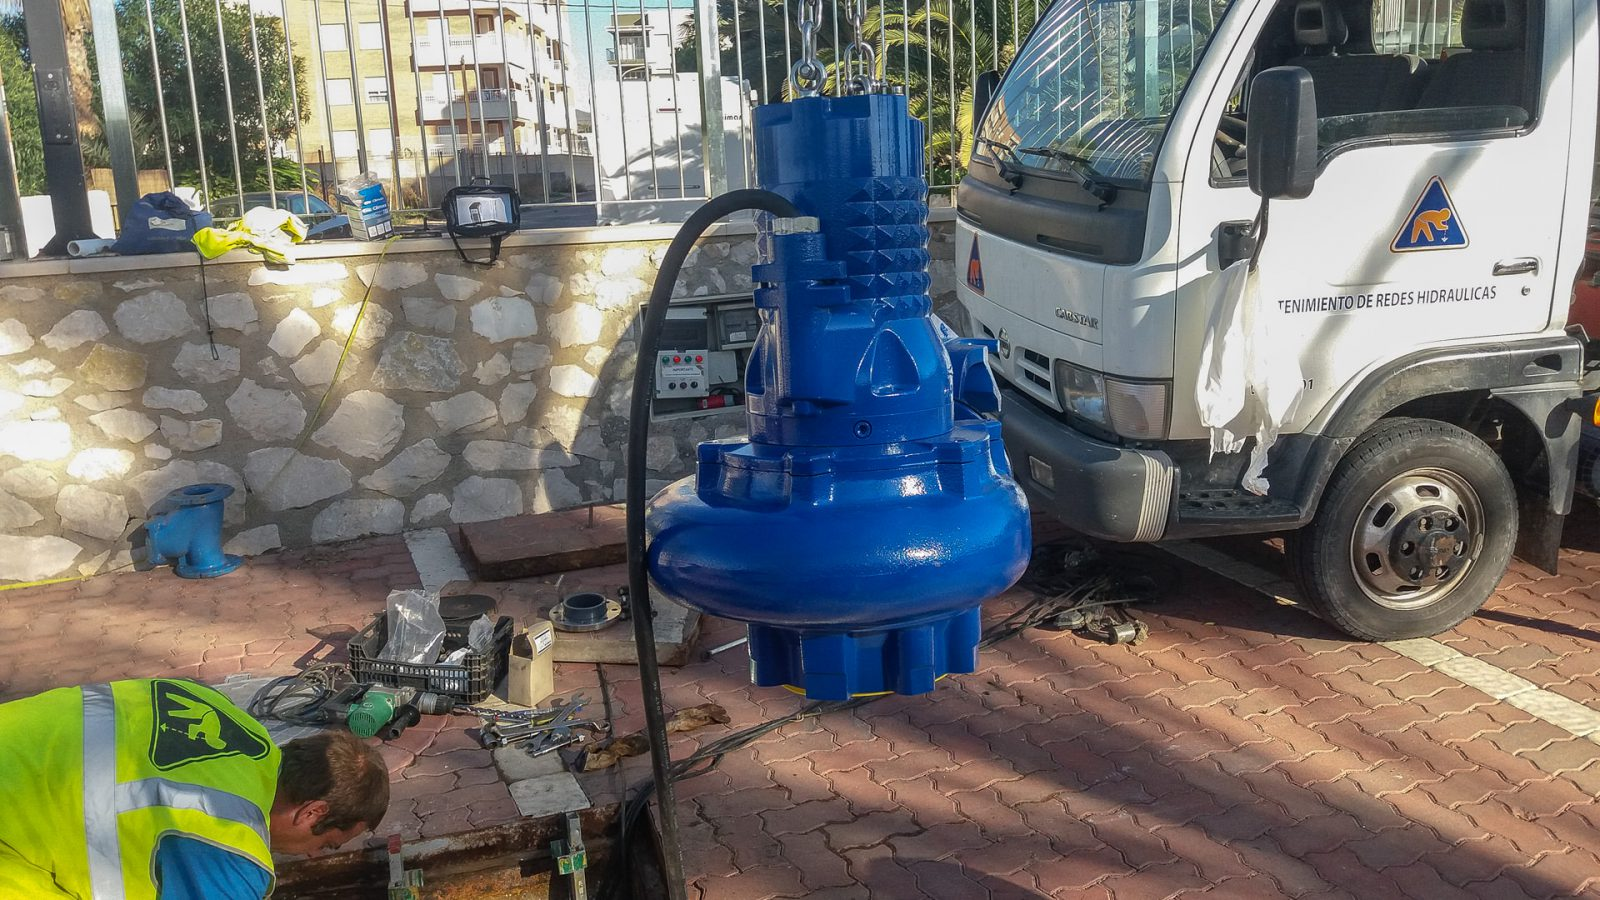 cauce-bombeo-de-aguas-residuales-02